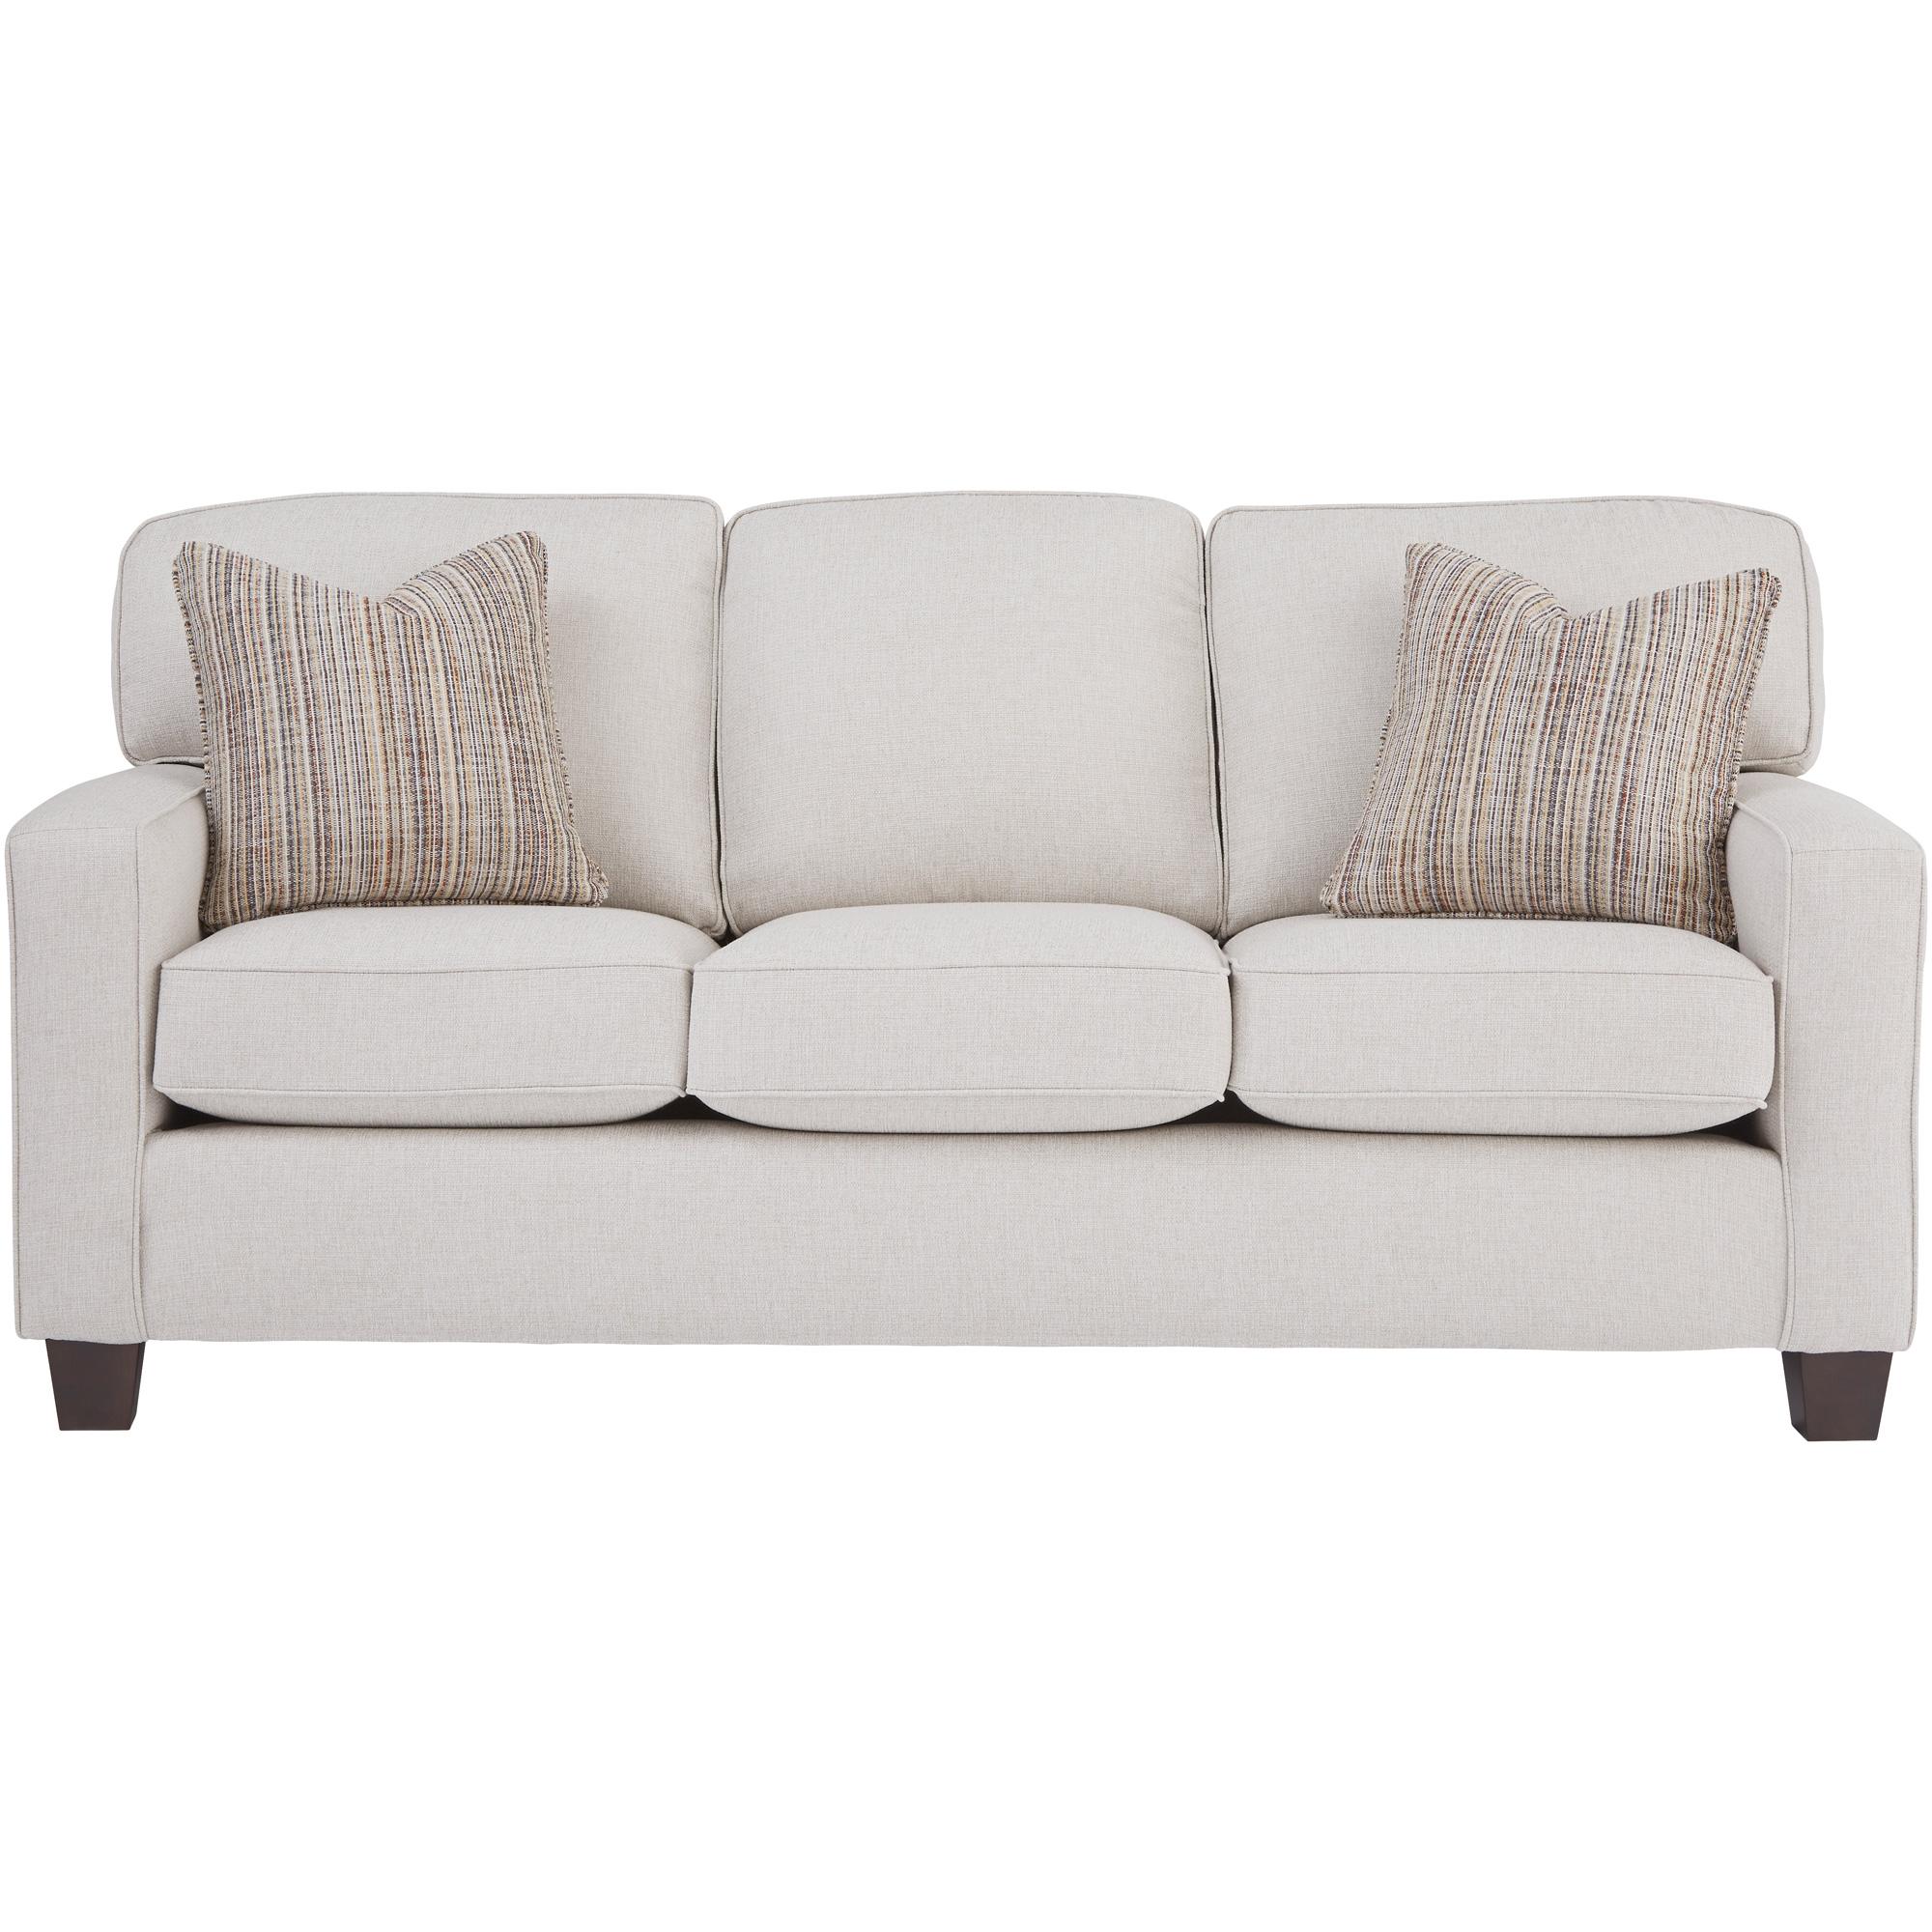 Best Home Furnishings | Annabel Cream Sofa